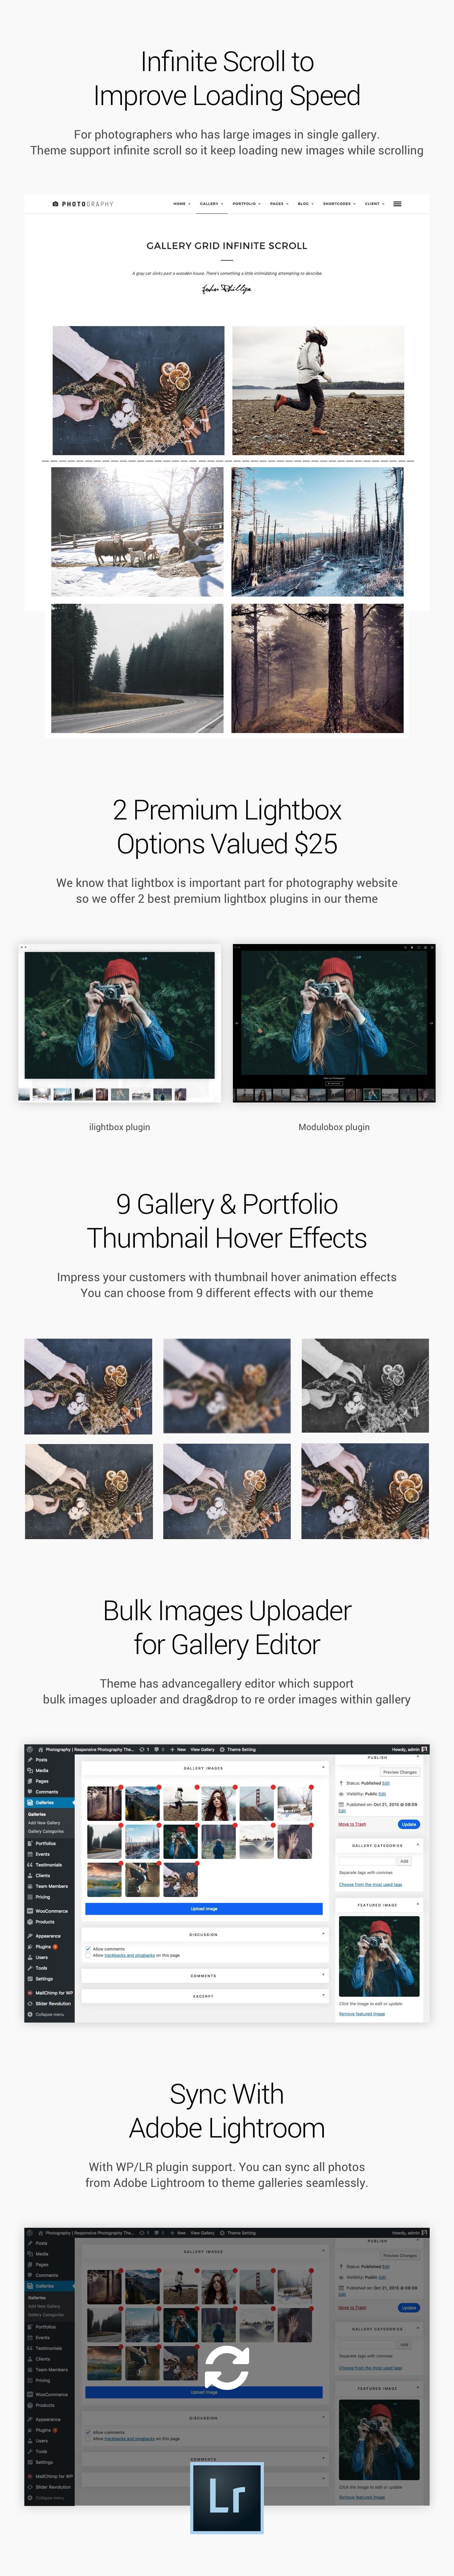 Theme Photography 6.1